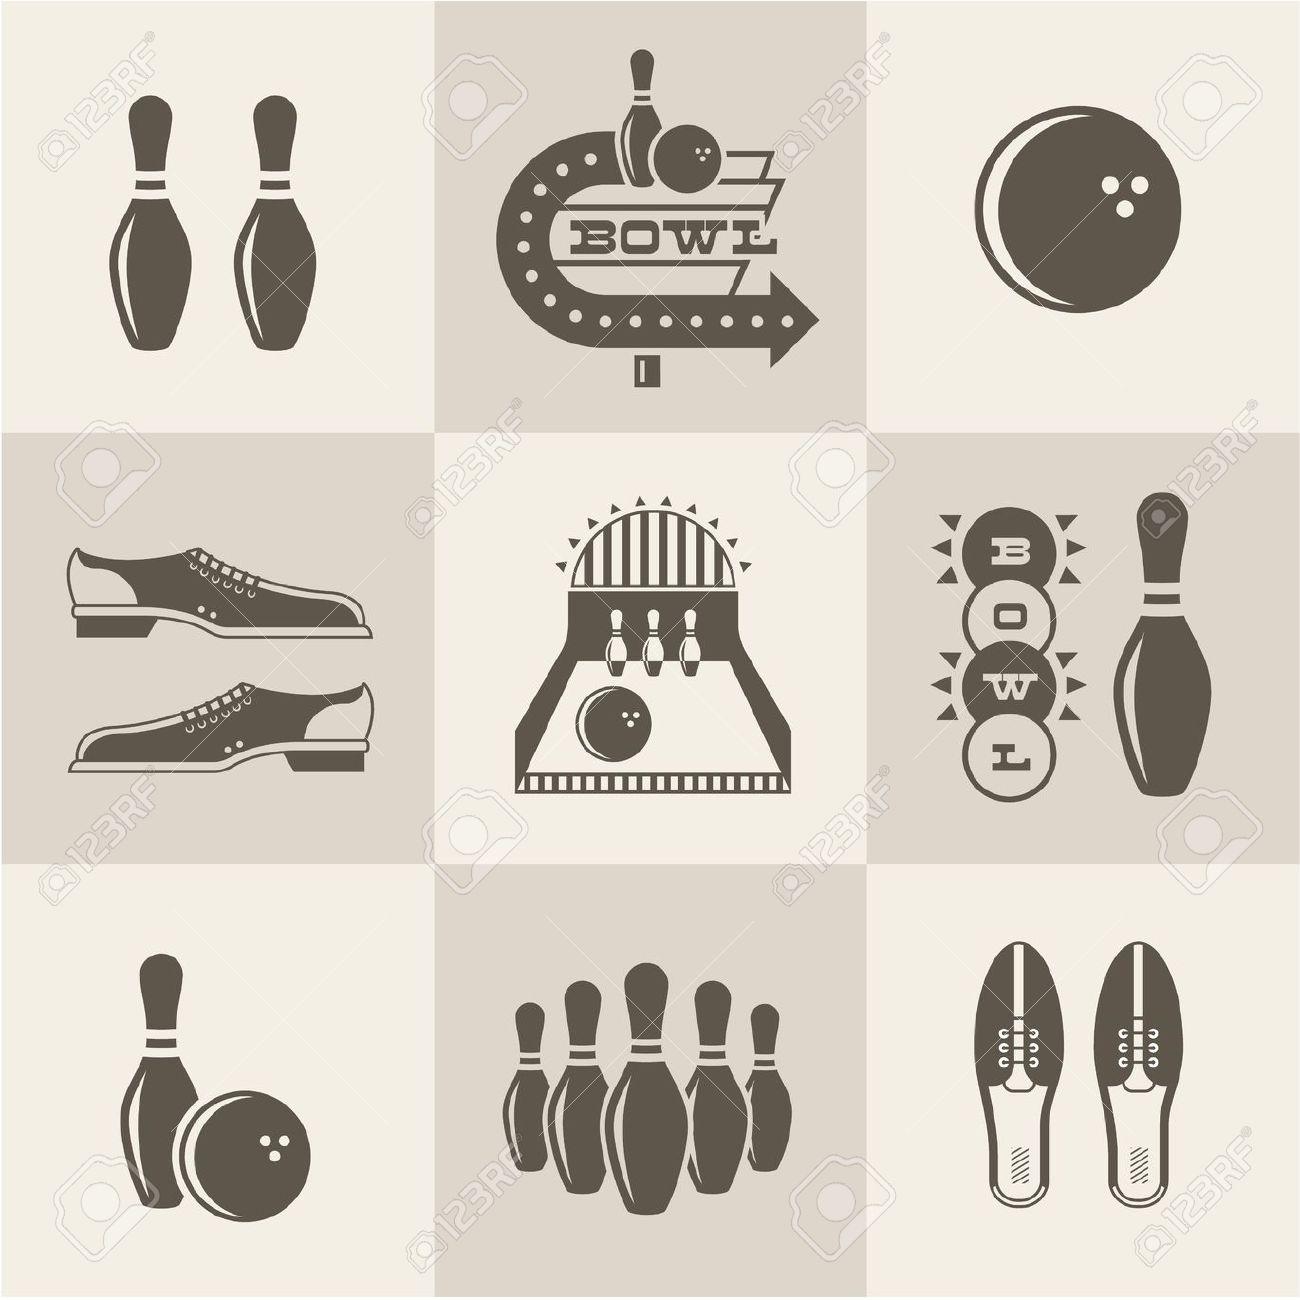 Vintage bowling logo clipart jpg royalty free stock Bowling Images & Stock Pictures. Royalty Free Bowling Photos And ... jpg royalty free stock